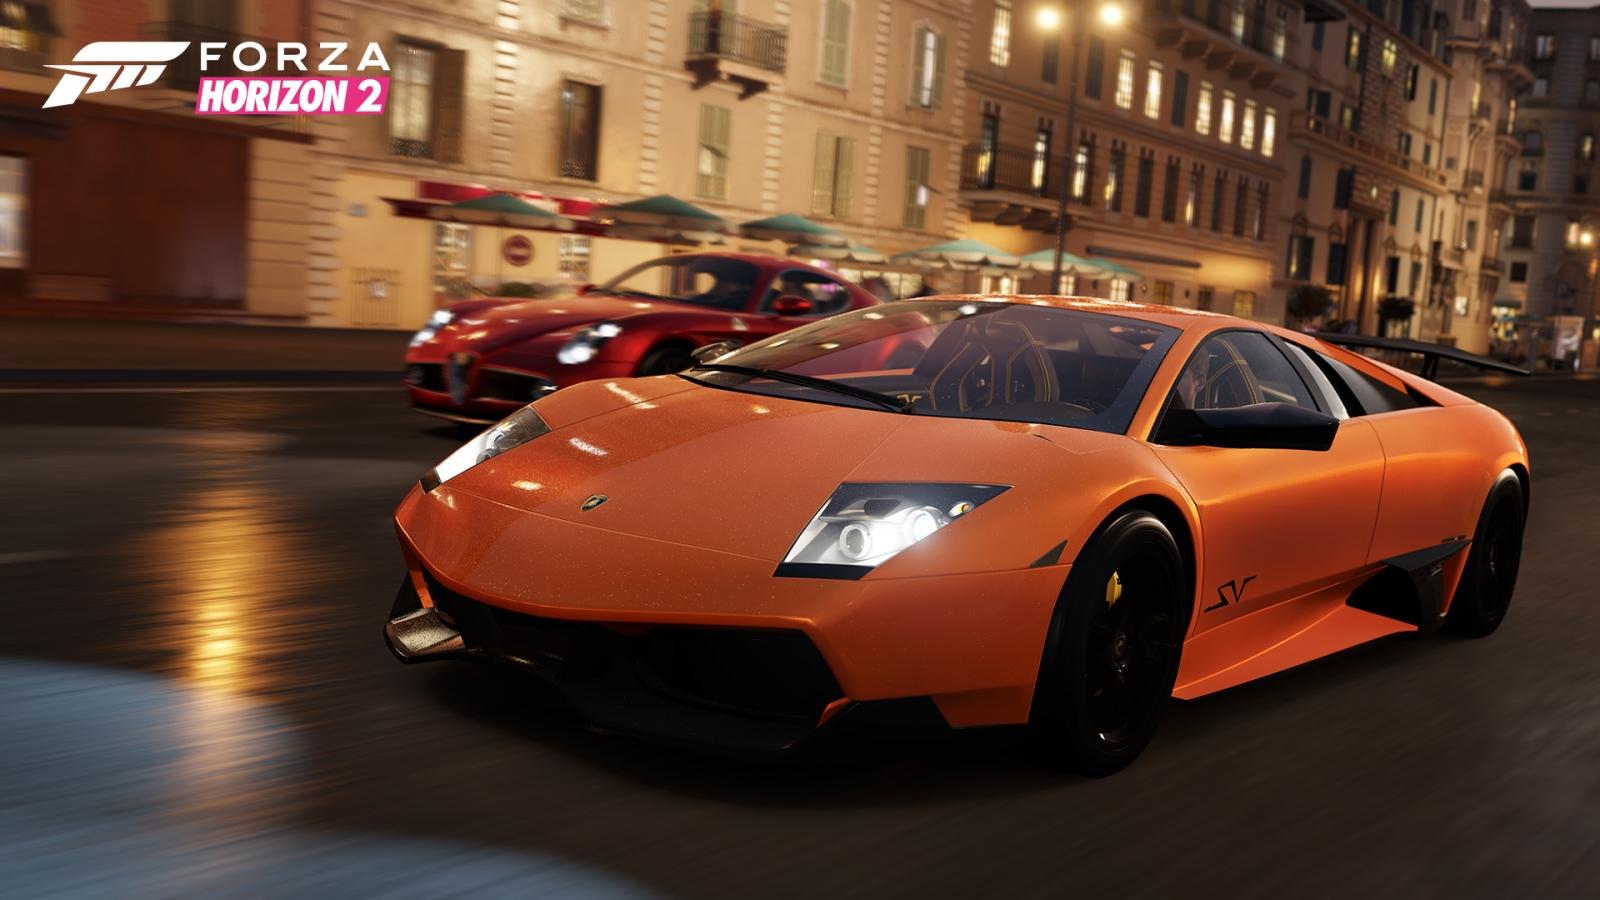 Koenigsegg One 1 >> Forza Horizon 2 Review: A Splendid Racing Game Full Of